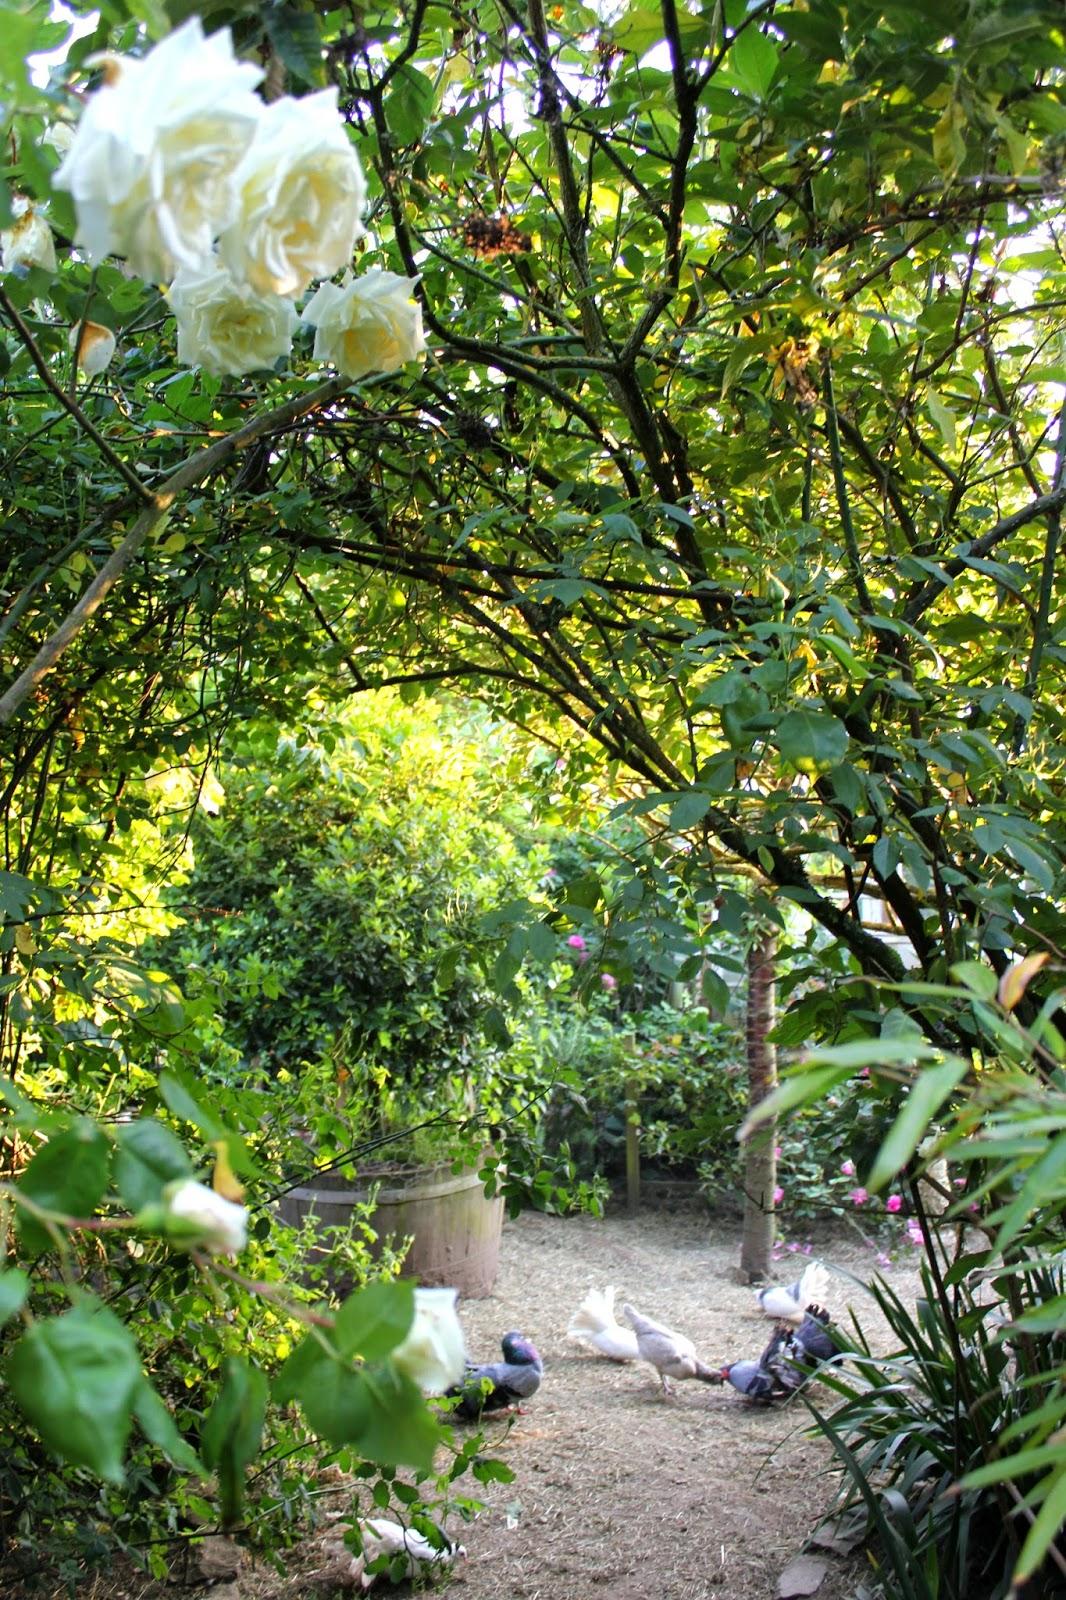 Rose arch in a forest garden